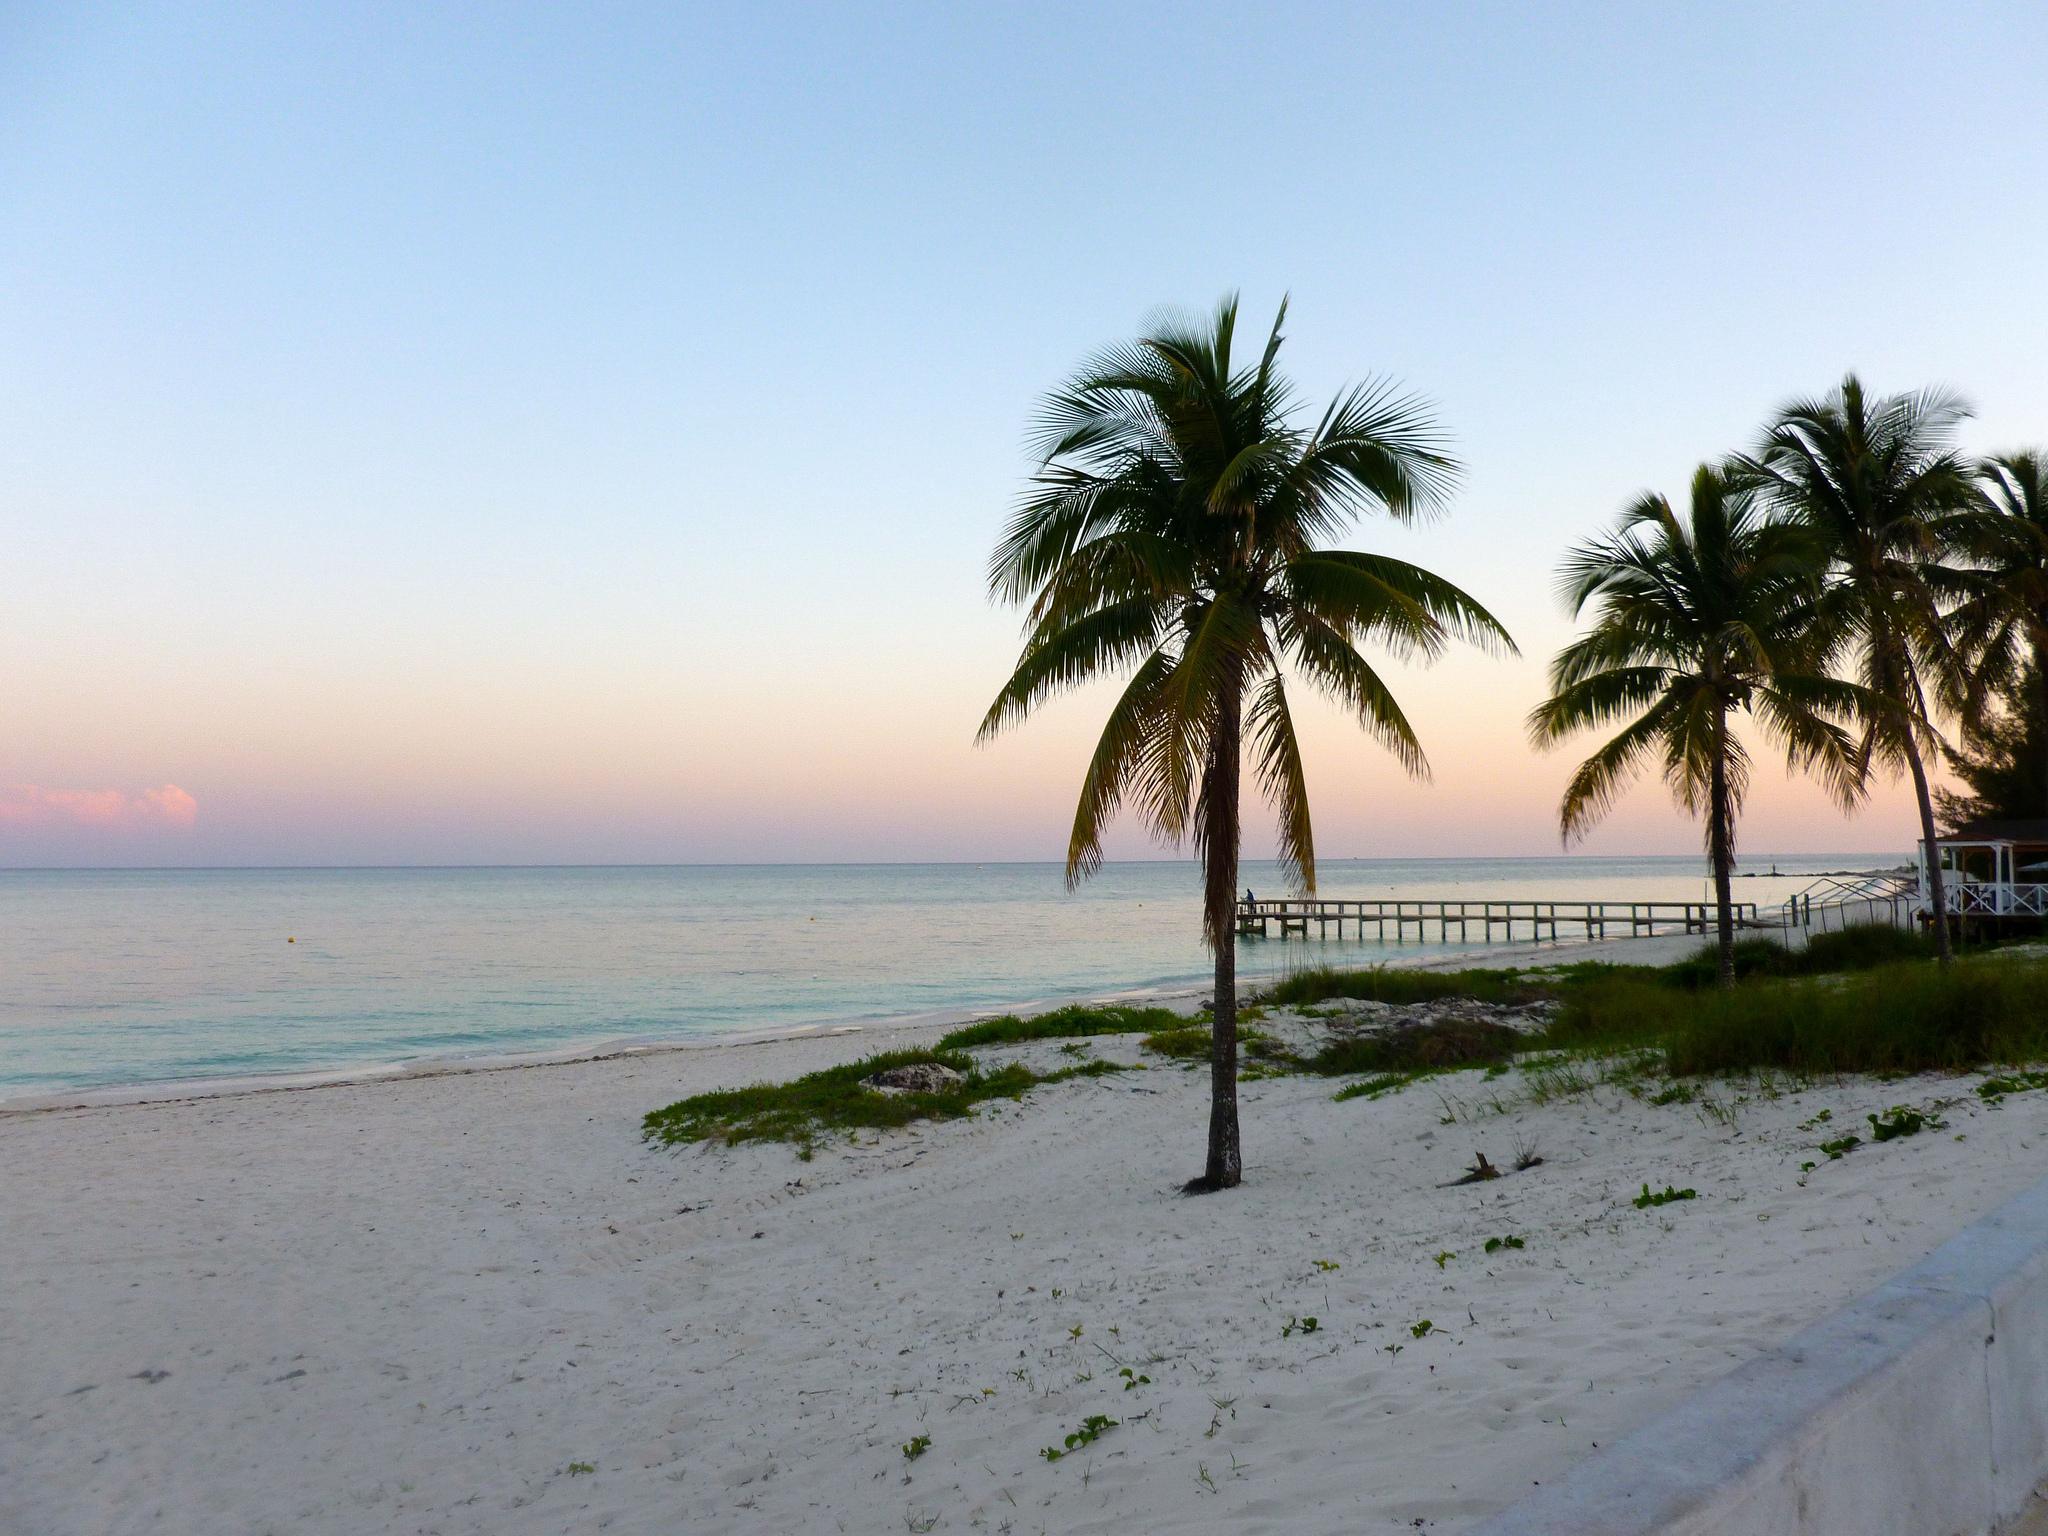 bahamas-parque-en-taino-praia-secret-world